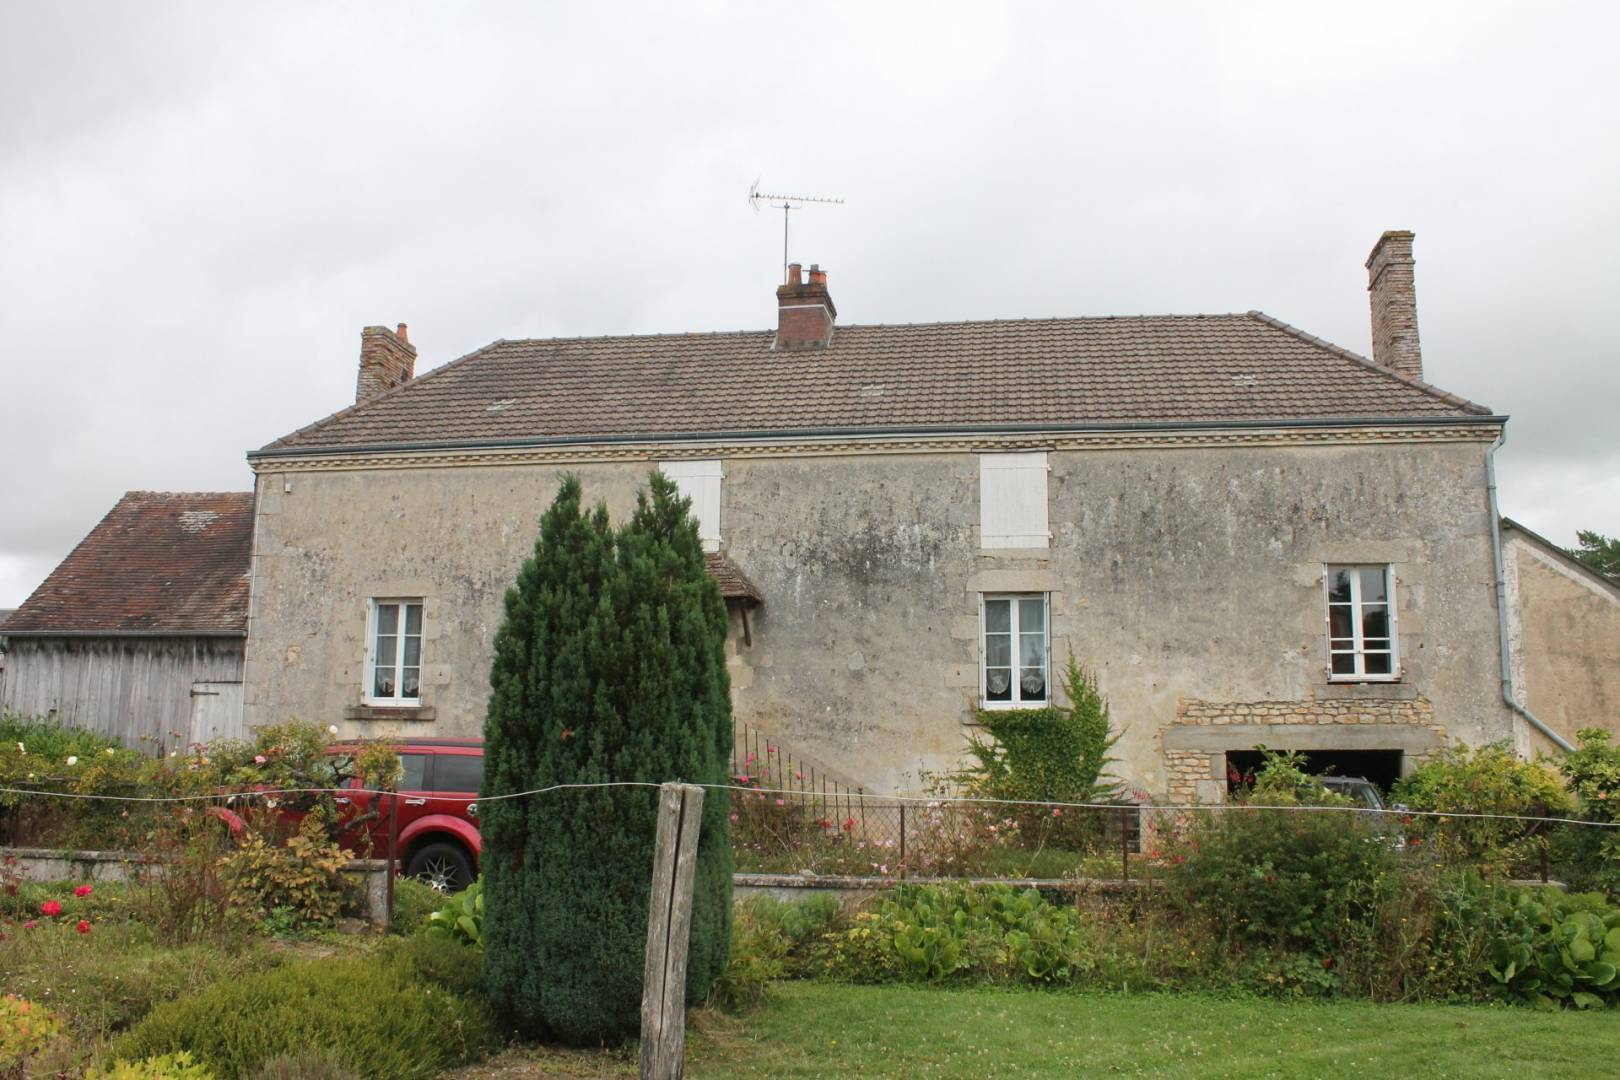 1 13 Oisseau-le-Petit